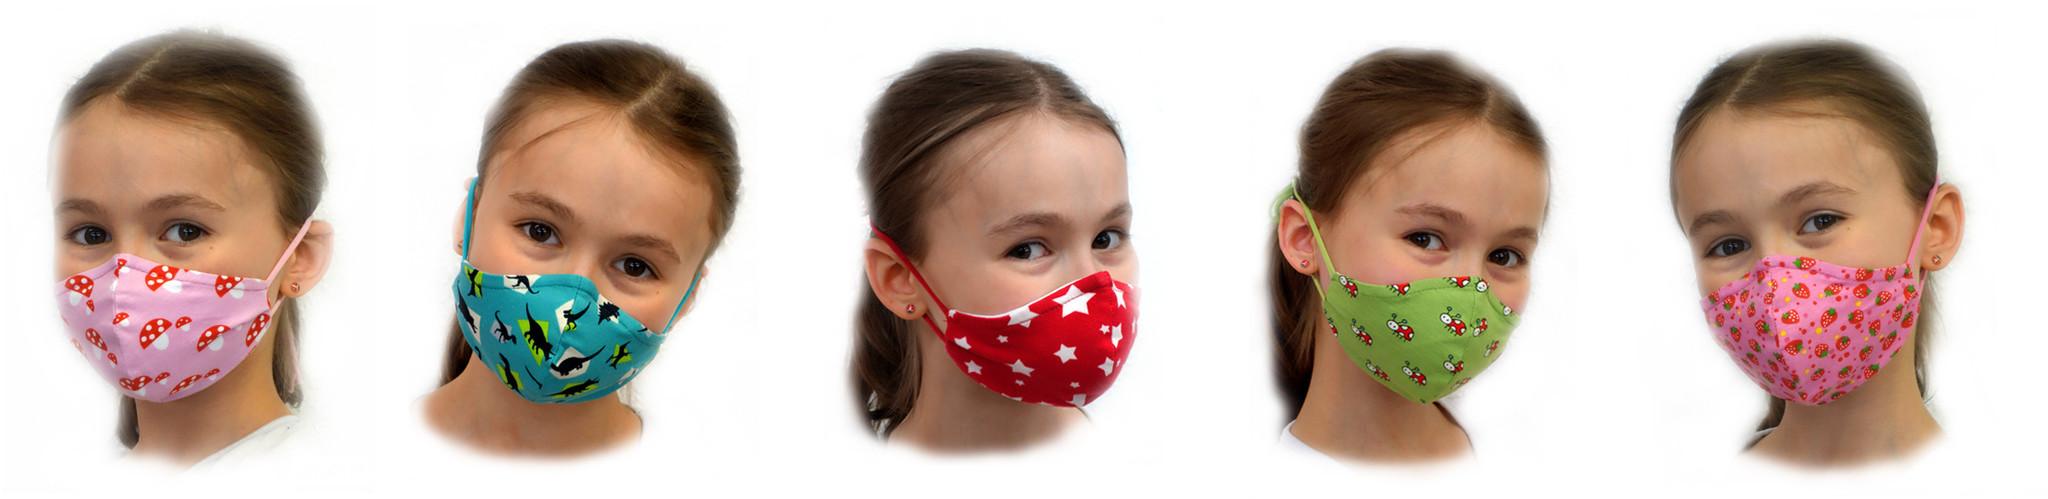 Kindermasken, Stoffmasken, bunte Masken, bunte Kindermasken, schöne Stoffmasken, Kindermasken mit Tieren, bunte Stoffmasken, lustige Kindermasken, schöne Kindermasken